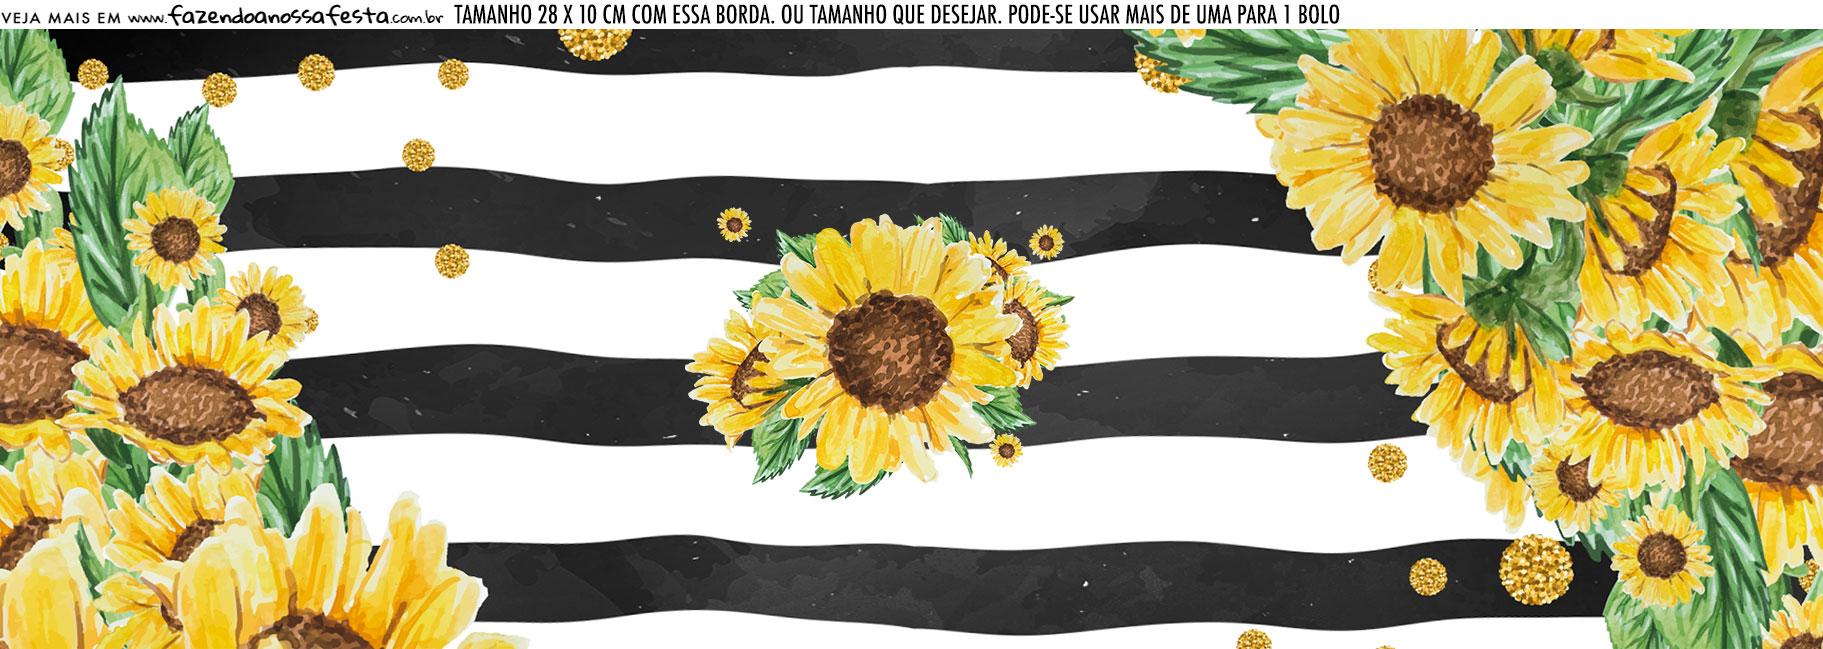 Saia Lateral de Bolo Kit Festa Girassol